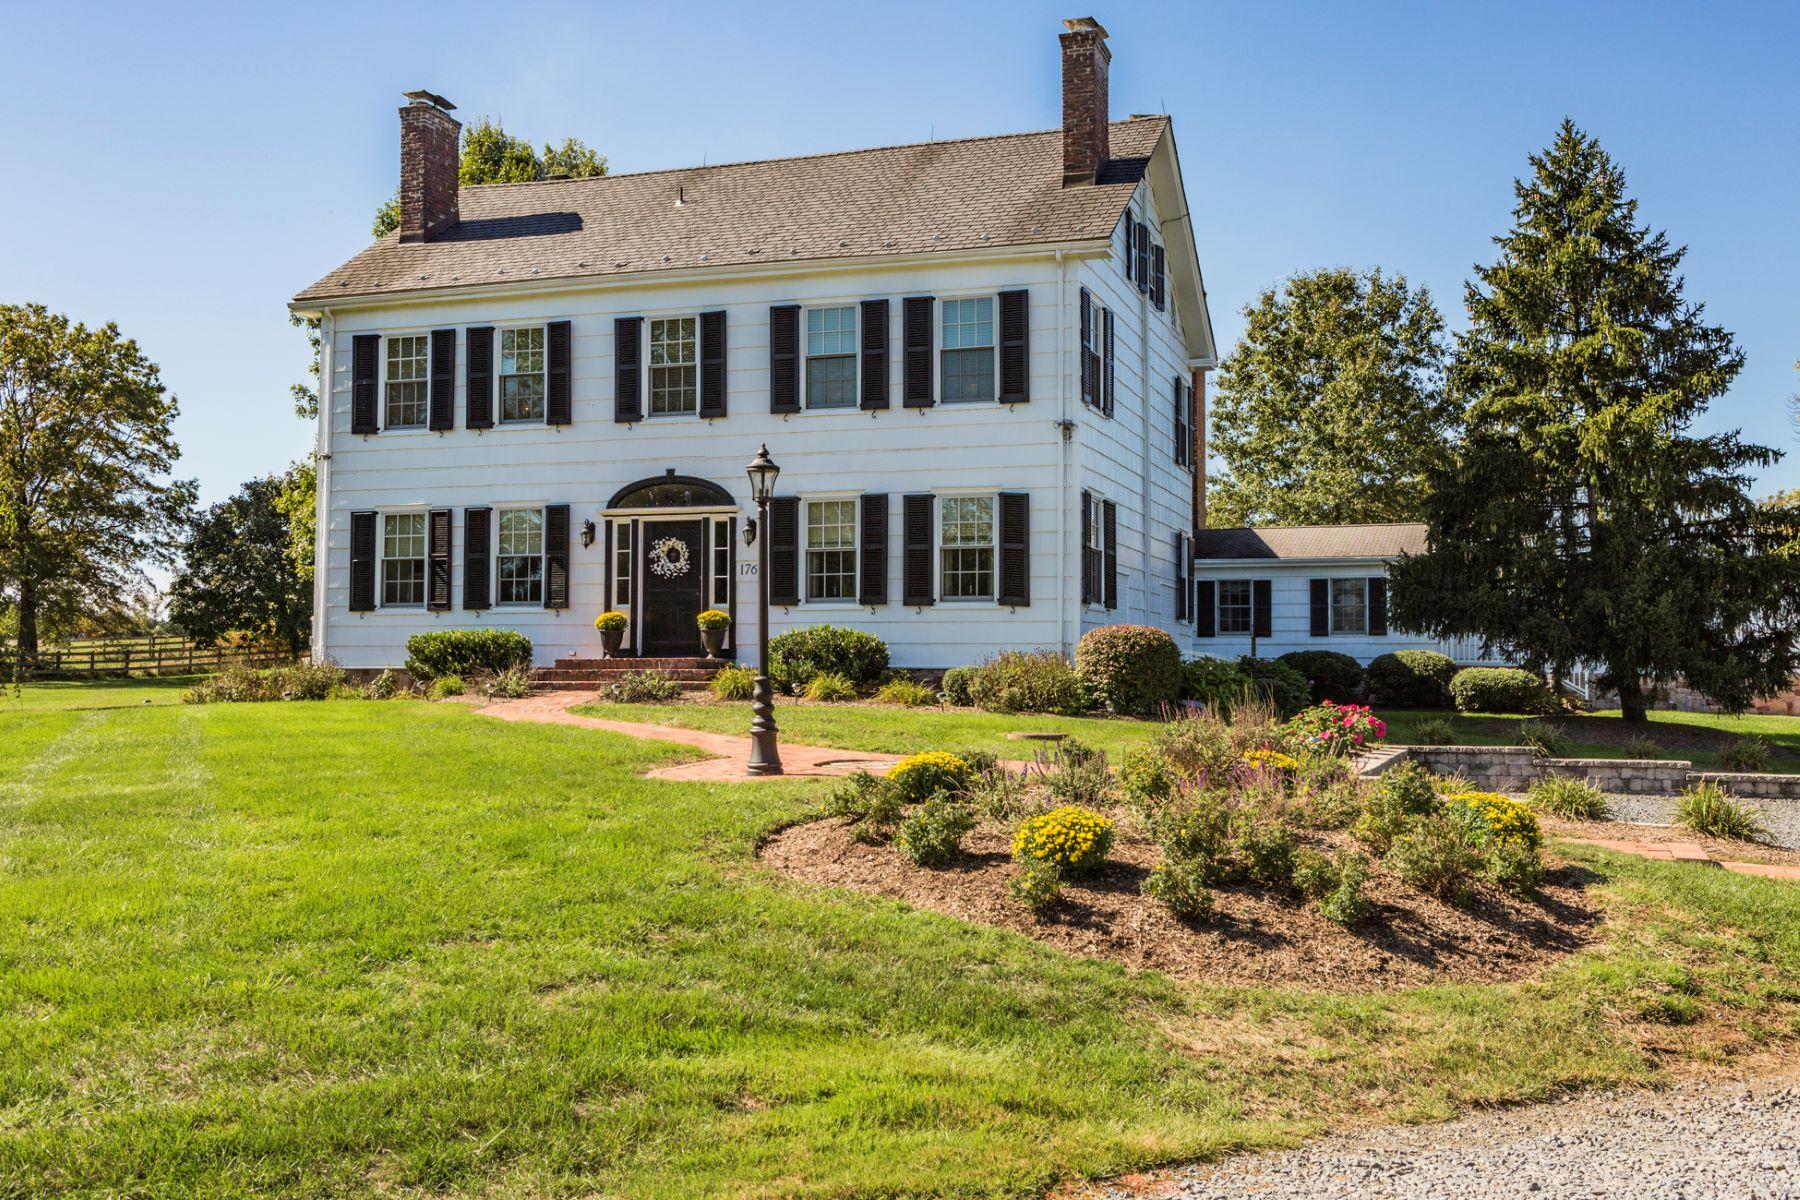 独户住宅 为 销售 在 An Enchanting Home 1760 Millstone River Road 希尔斯堡, 08844 美国